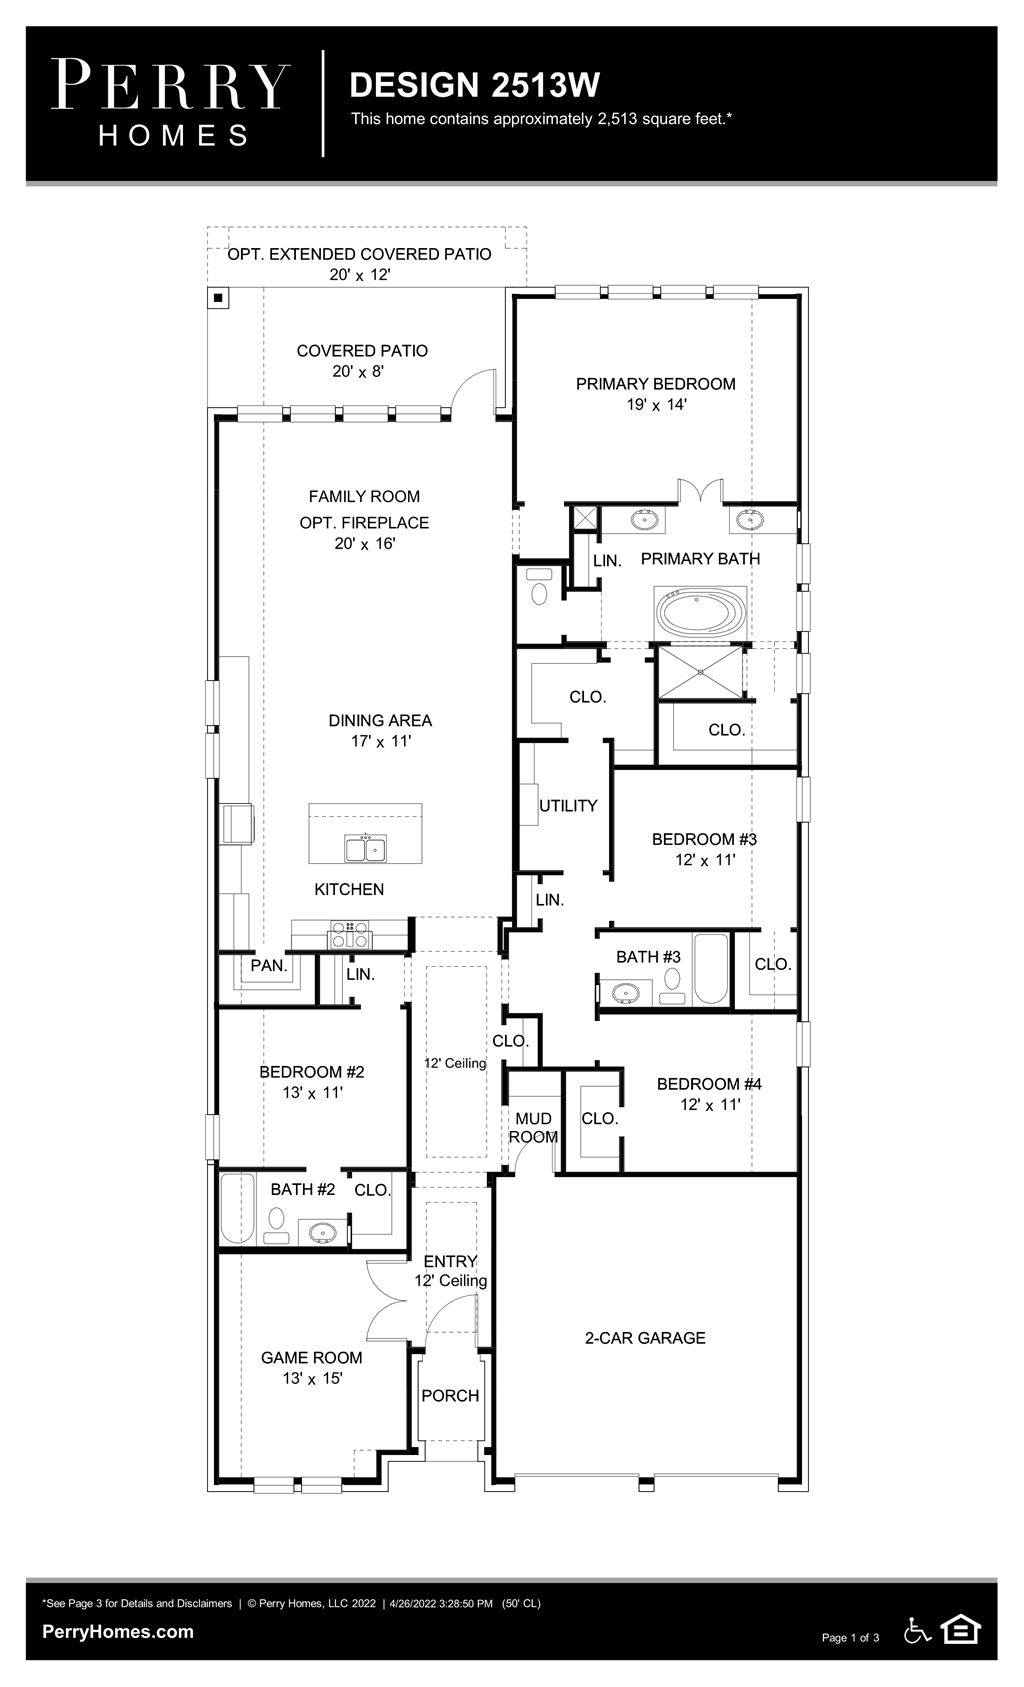 Floor Plan for 2513W